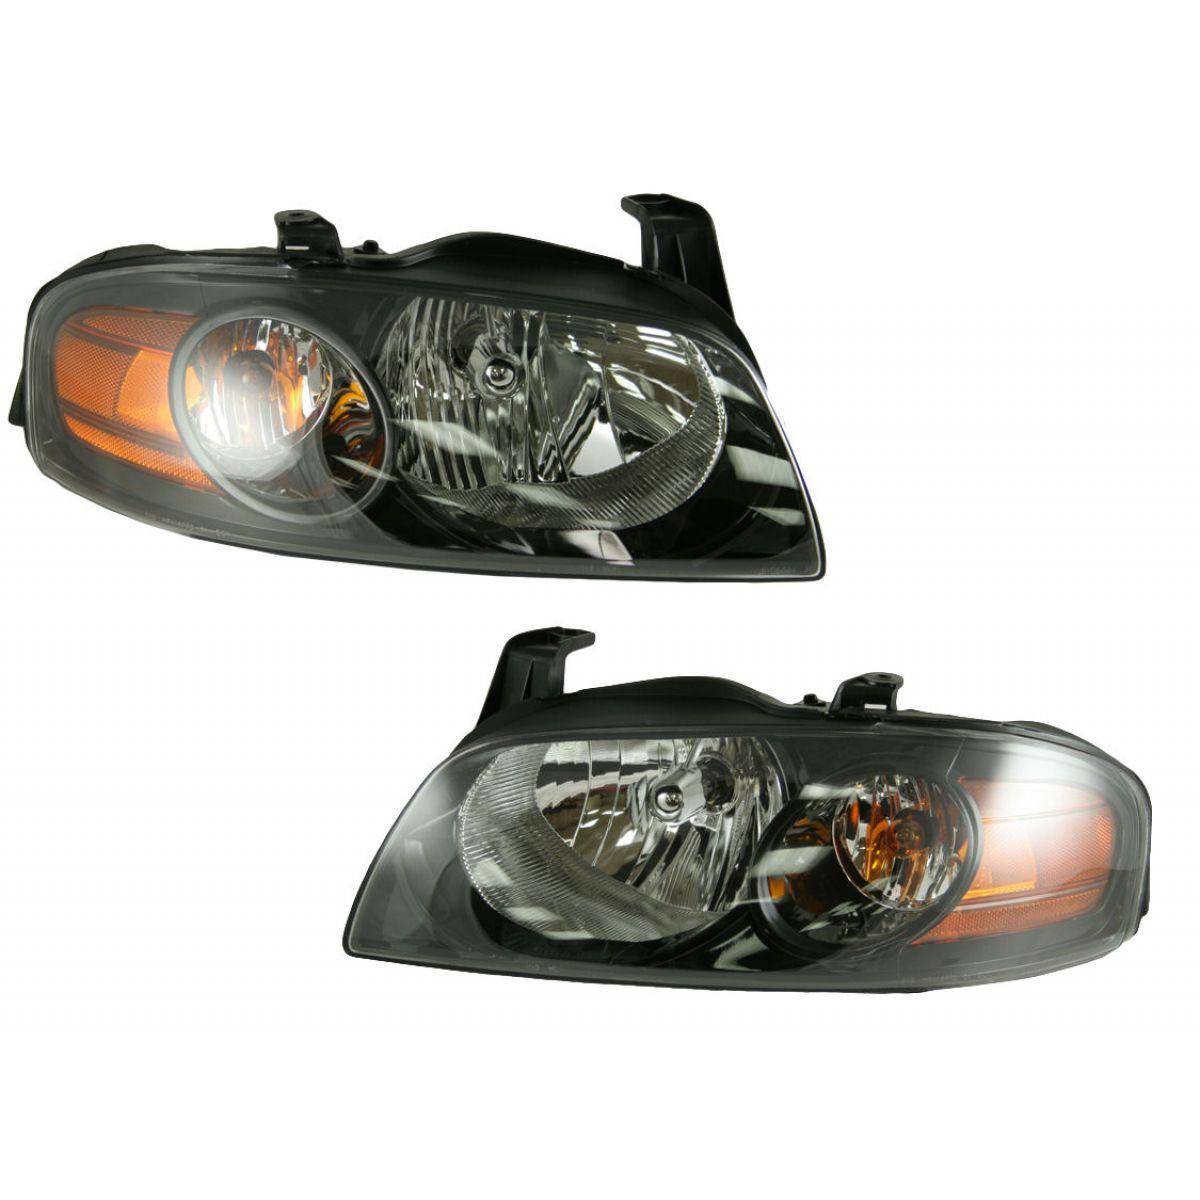 headlights headlamps lamp pair set new for 04 06 nissan. Black Bedroom Furniture Sets. Home Design Ideas